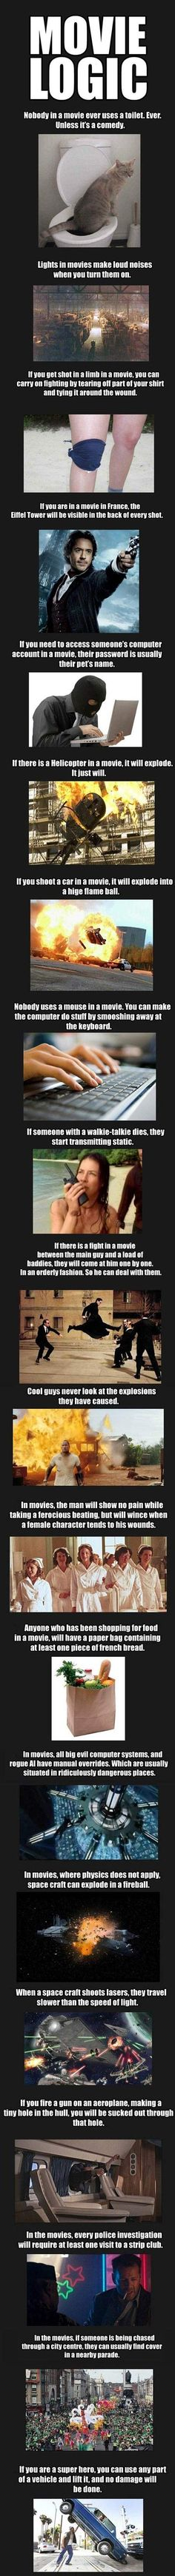 Movie logic, pretty accurate